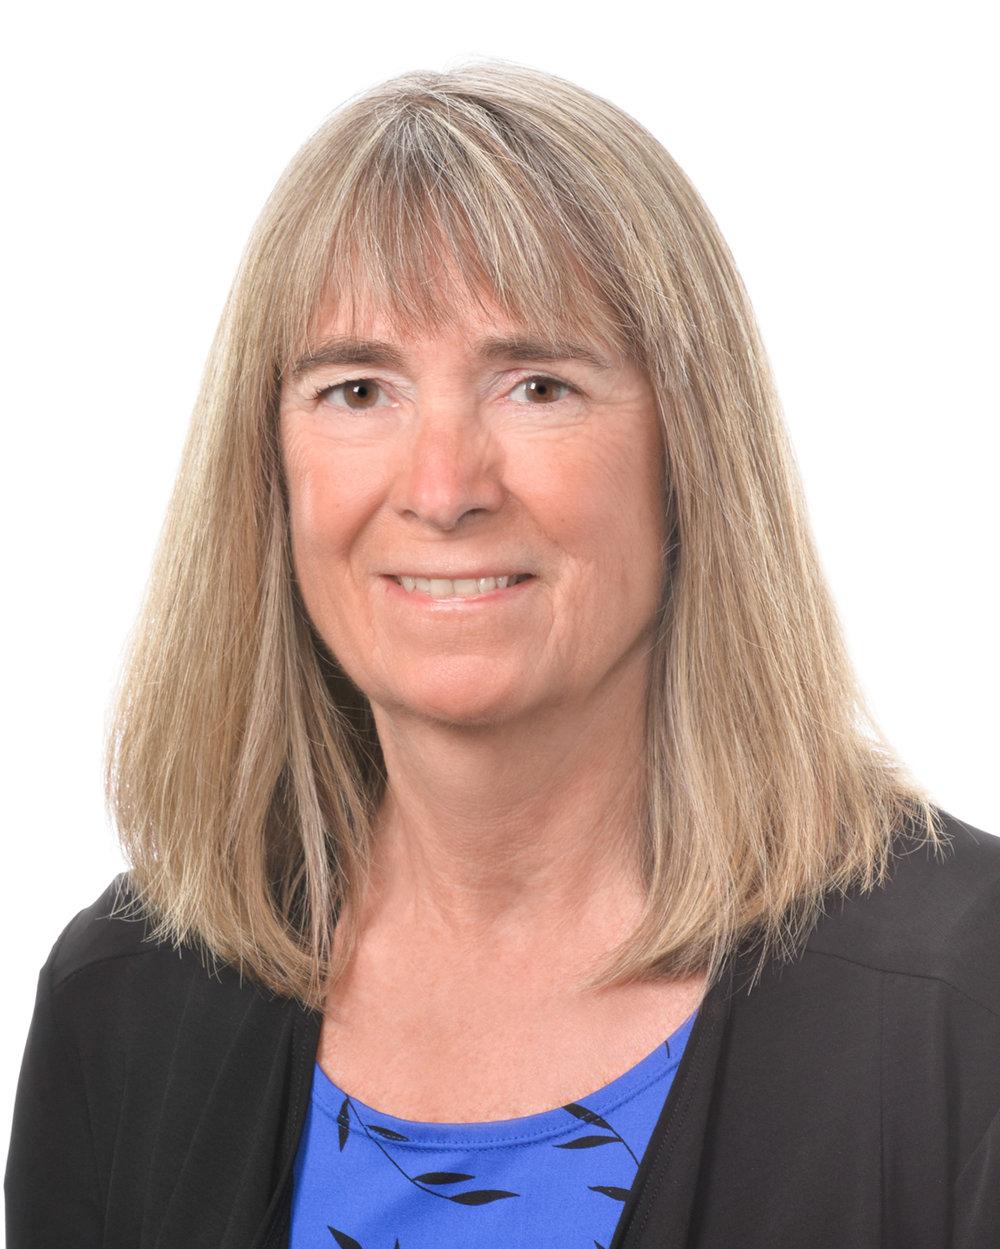 Bette J. Dodd - Director